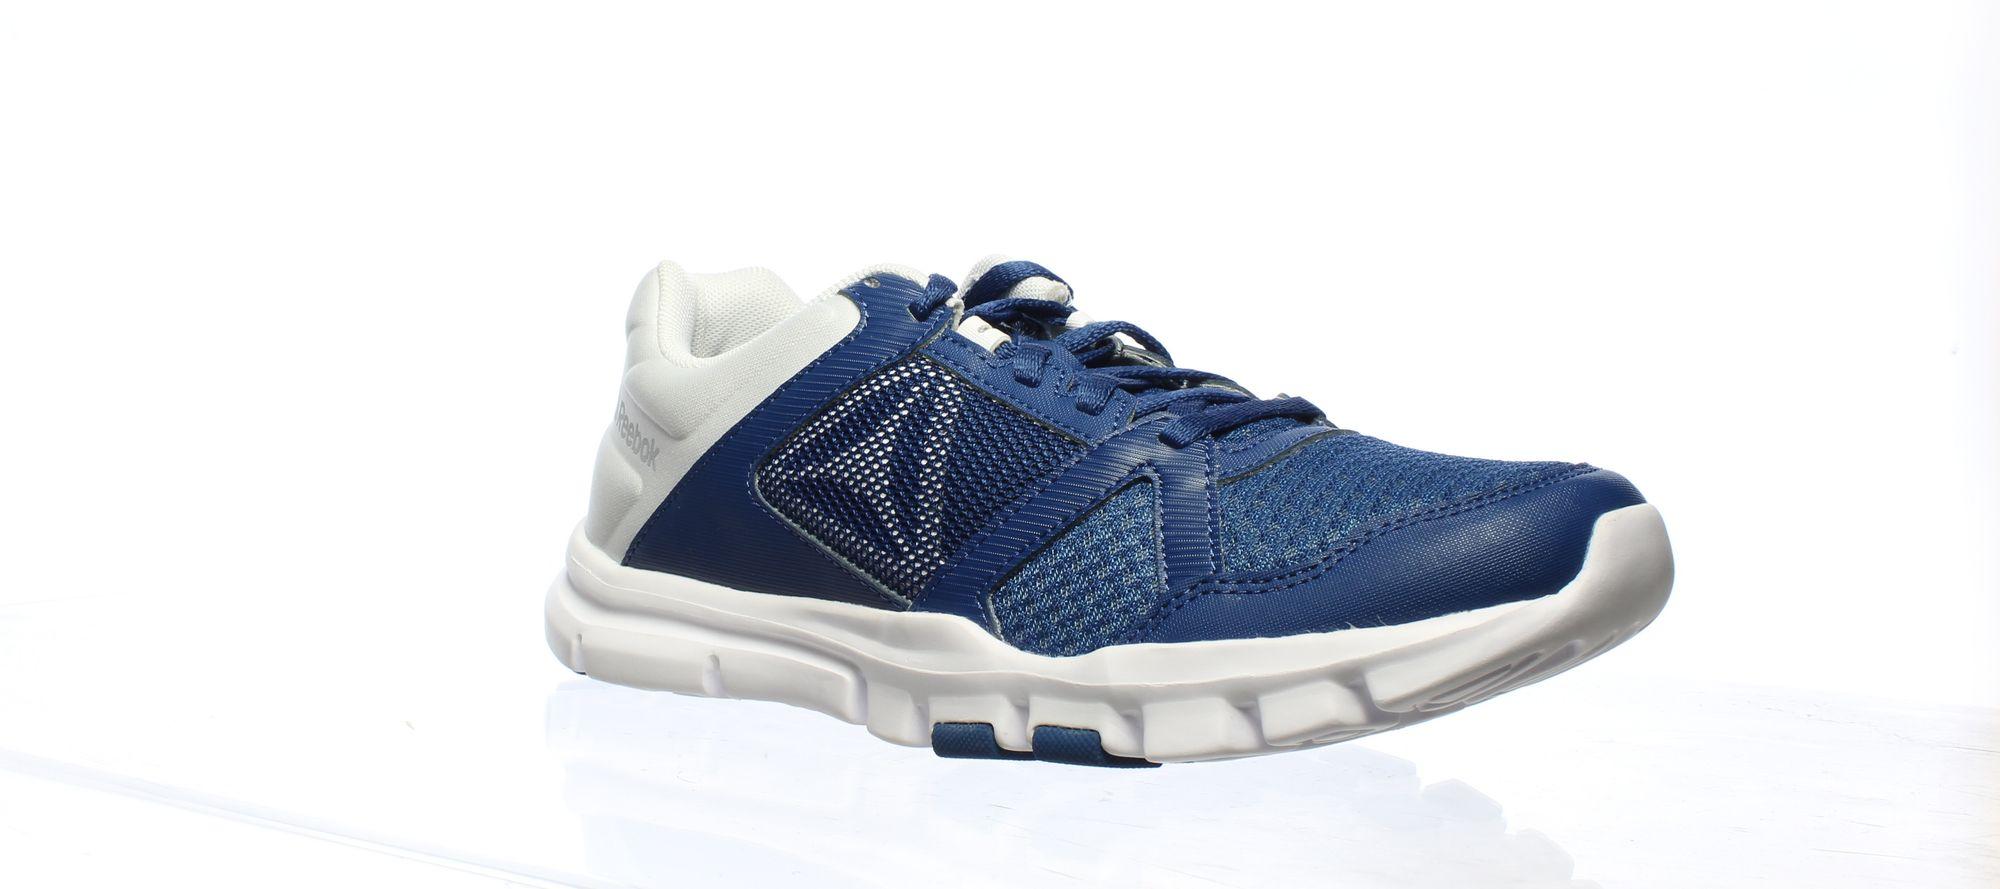 Reebok-Mens-Yourflex-Train-10-Cross-Training-Shoes miniature 8